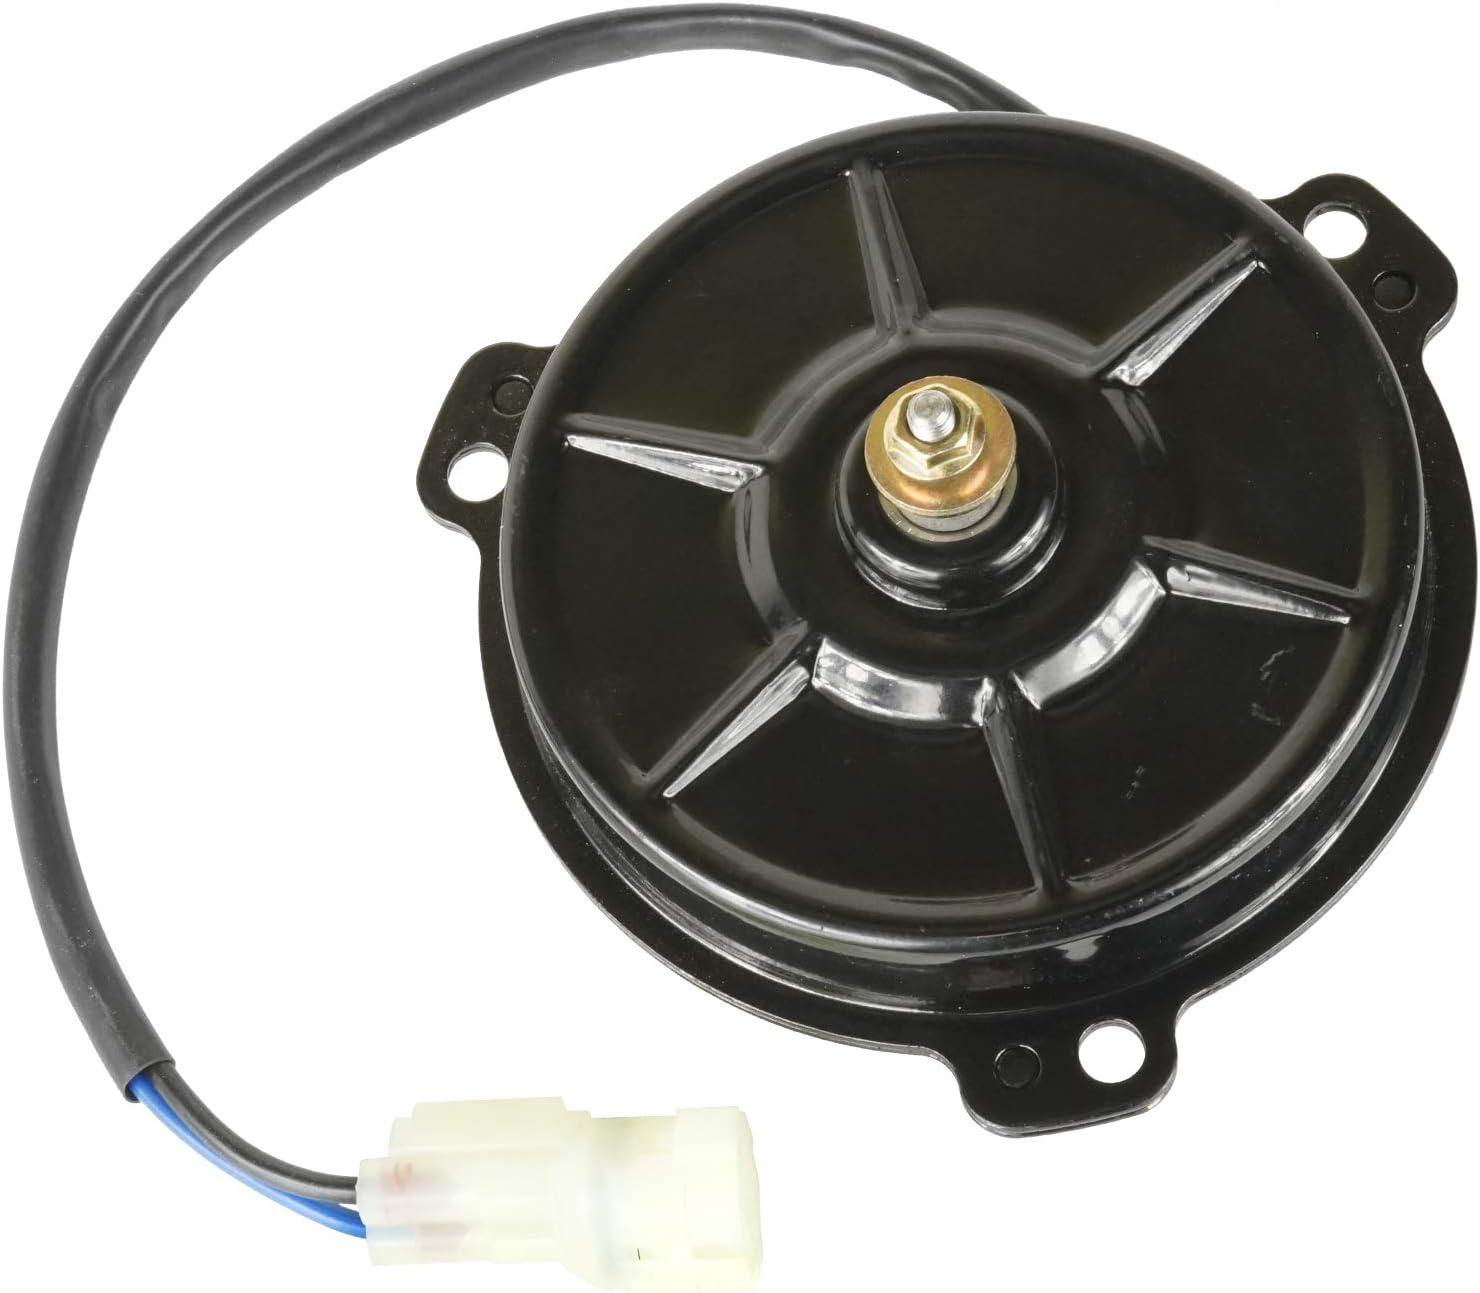 Caltric Radiator Cooling Fan Motor for Honda Trx500Fm Trx500Fpm Foreman 500 2012-2013